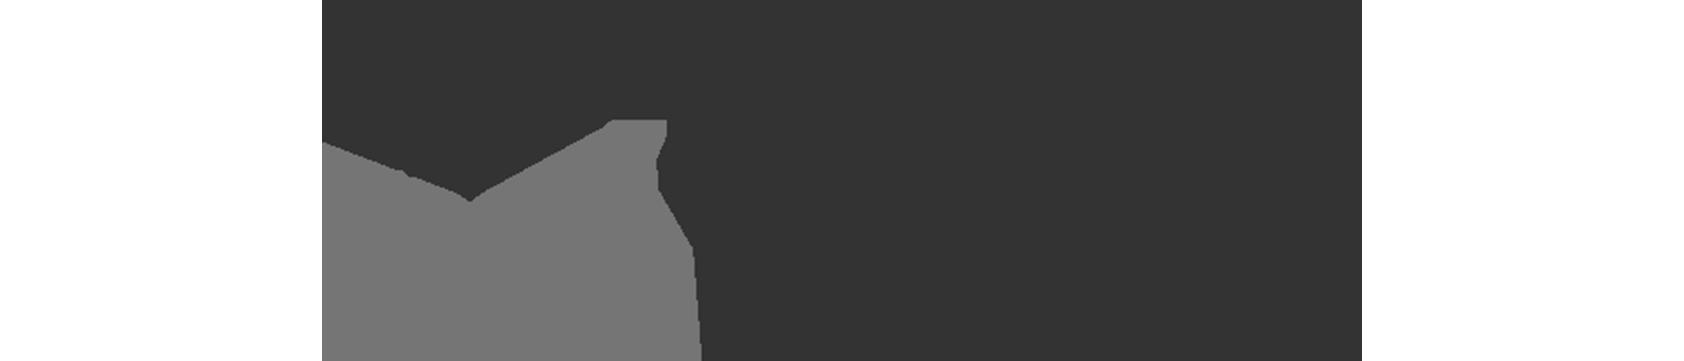 Opdrachtgevers-TVVL